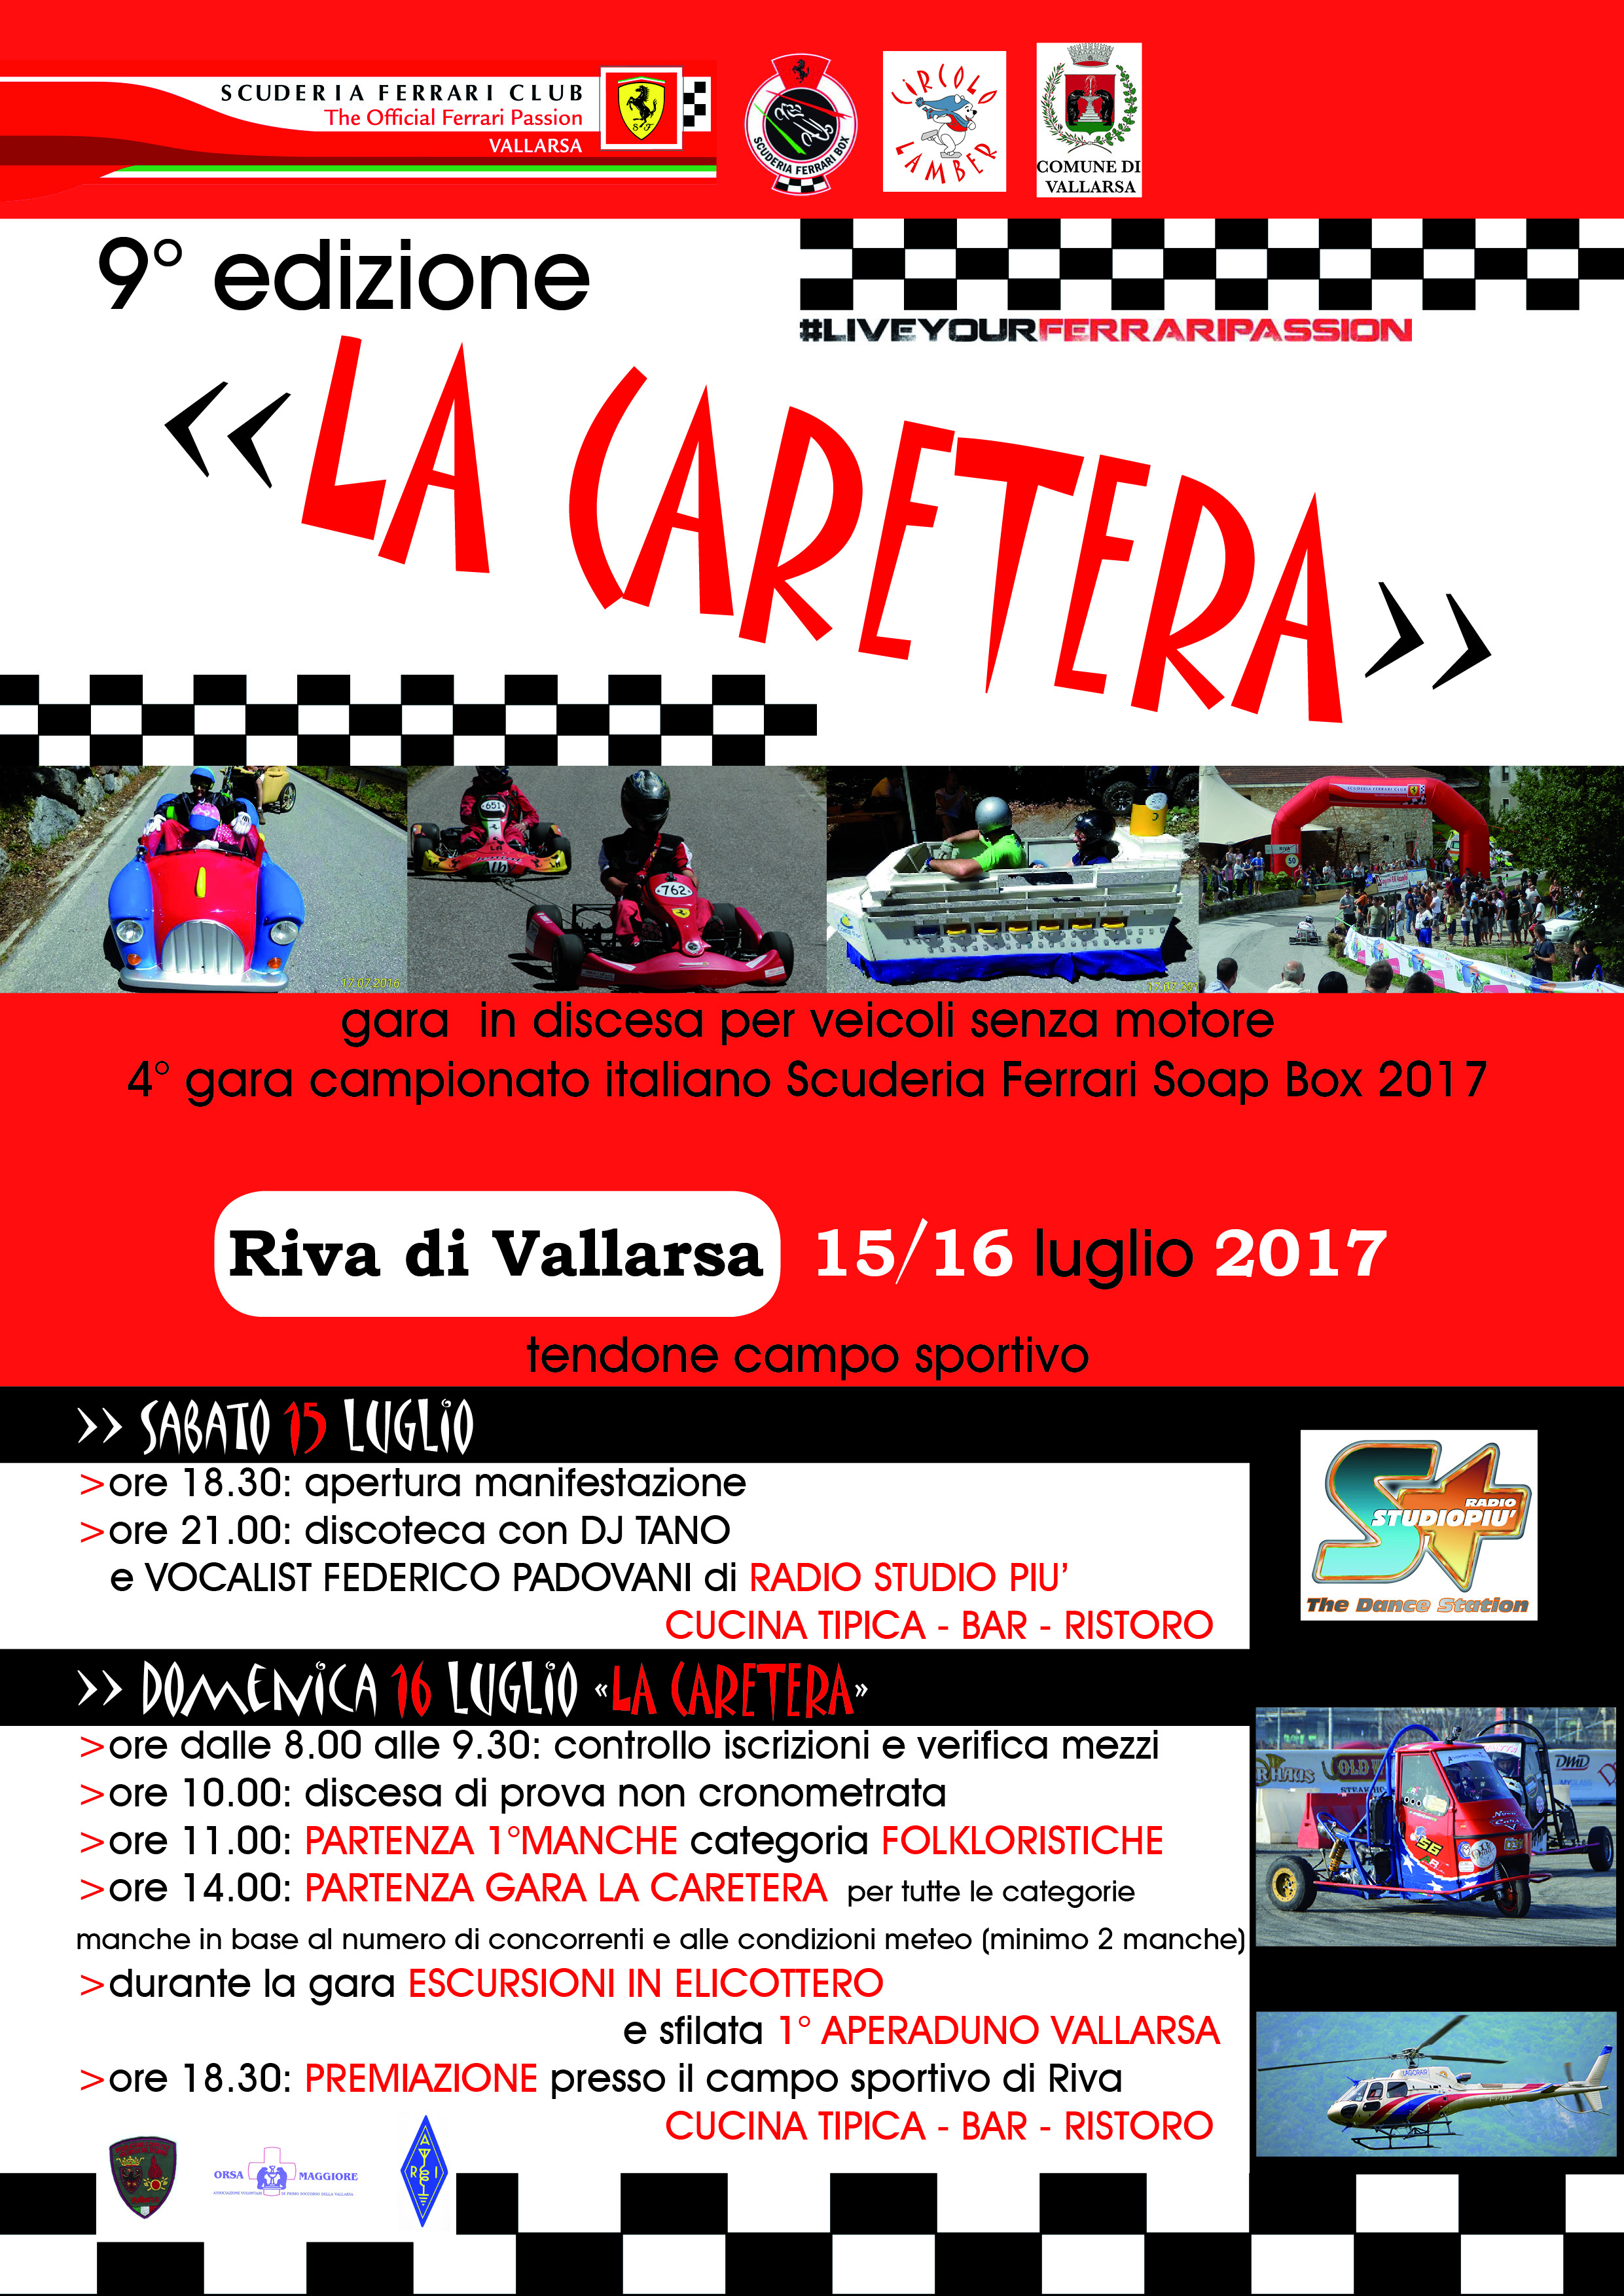 volantino CARETERA 2016